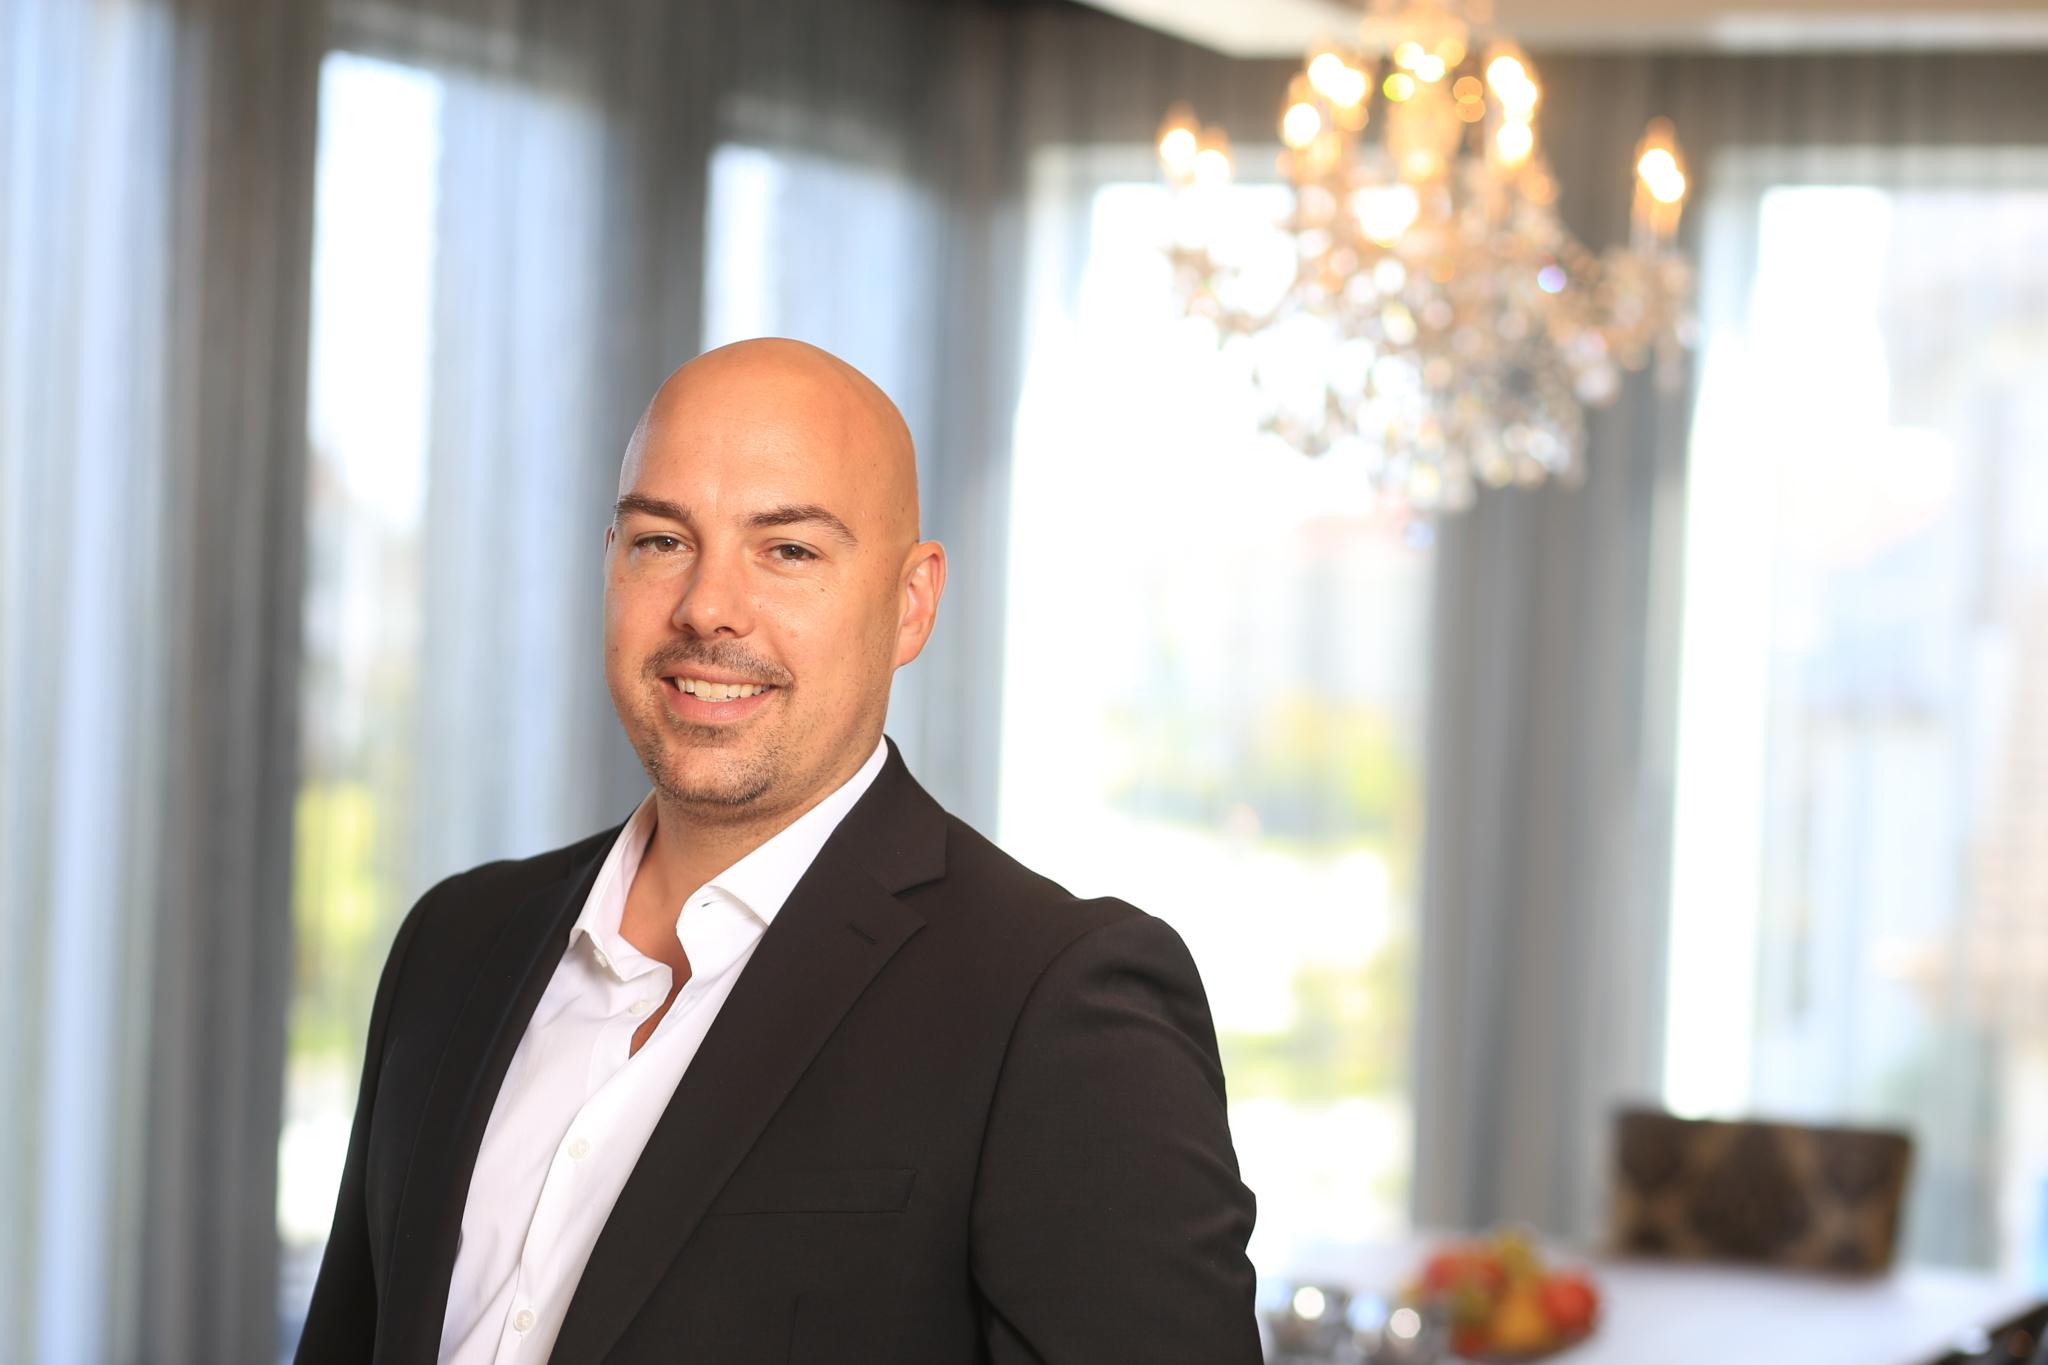 Nicholas Berta Courtier Immobilier